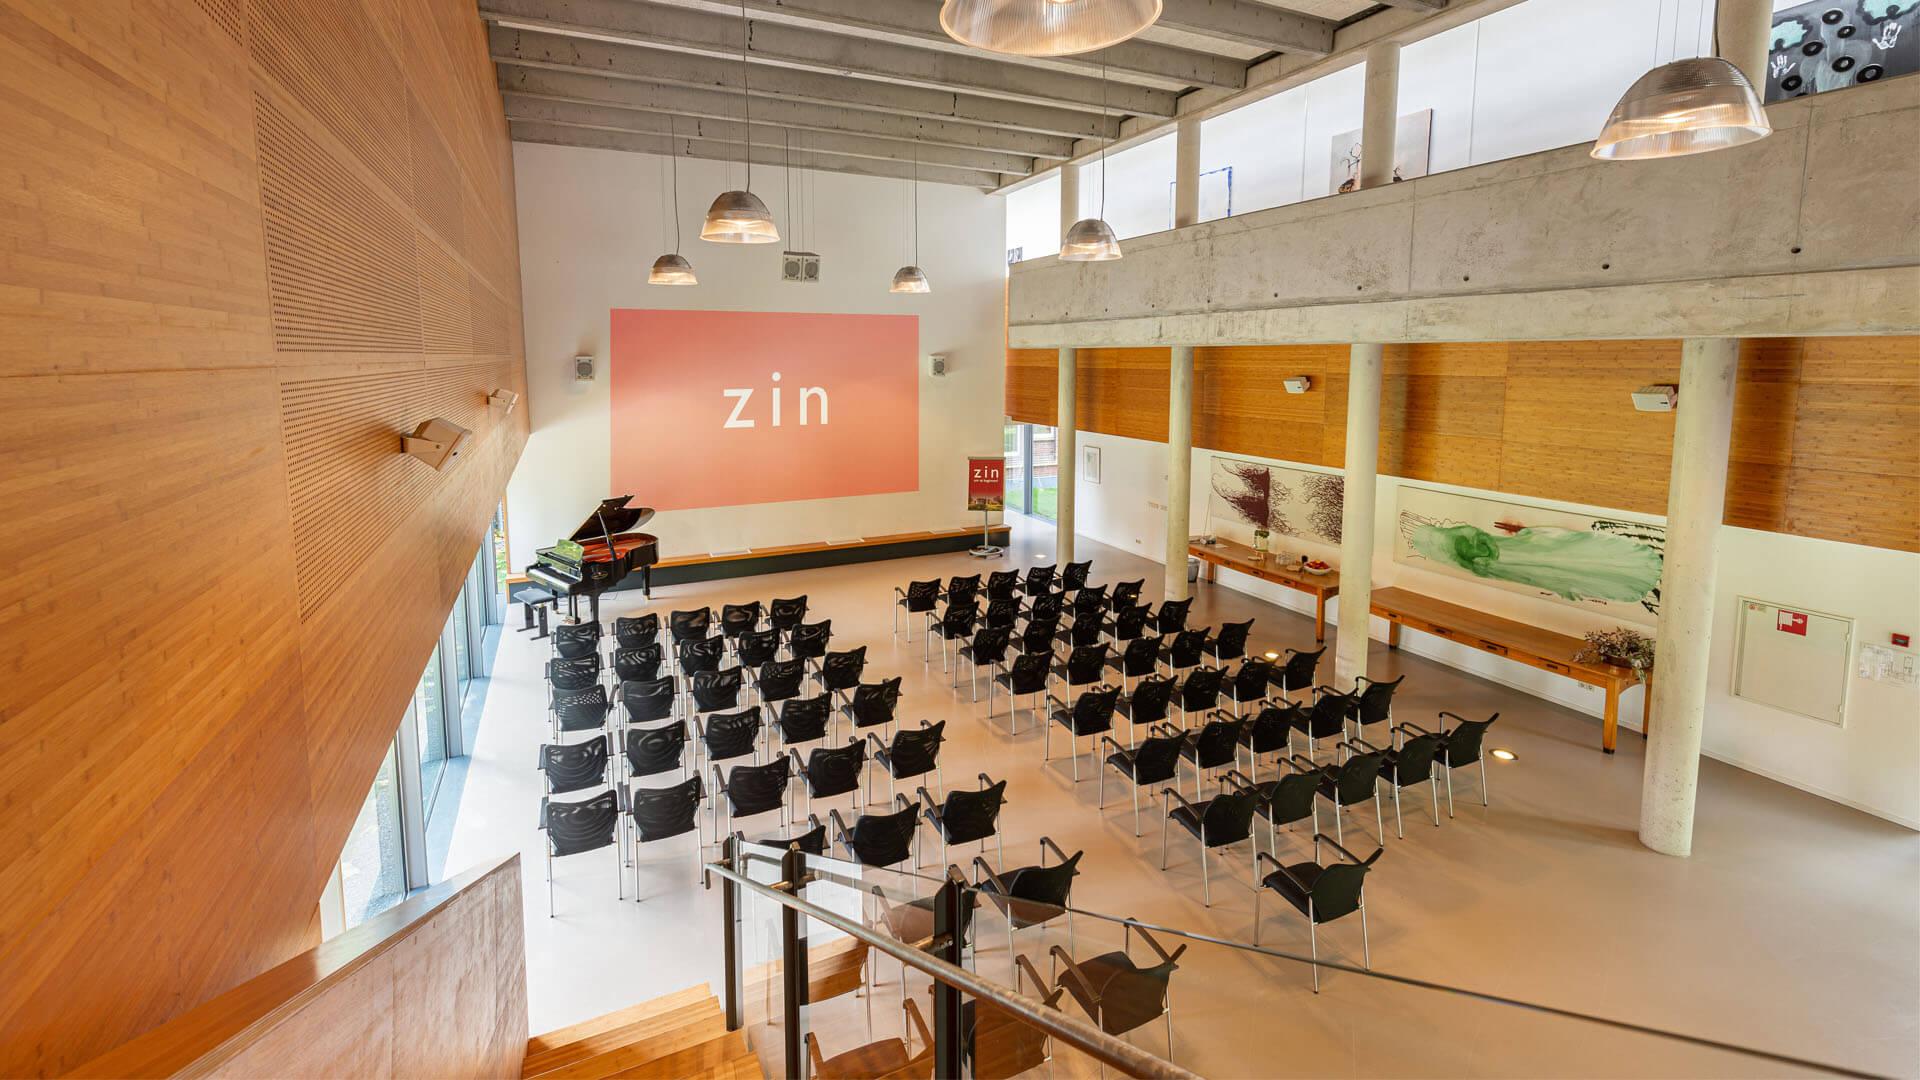 Kloosterhotel ZIN Auditorium scherm theateropstelling theater beamer